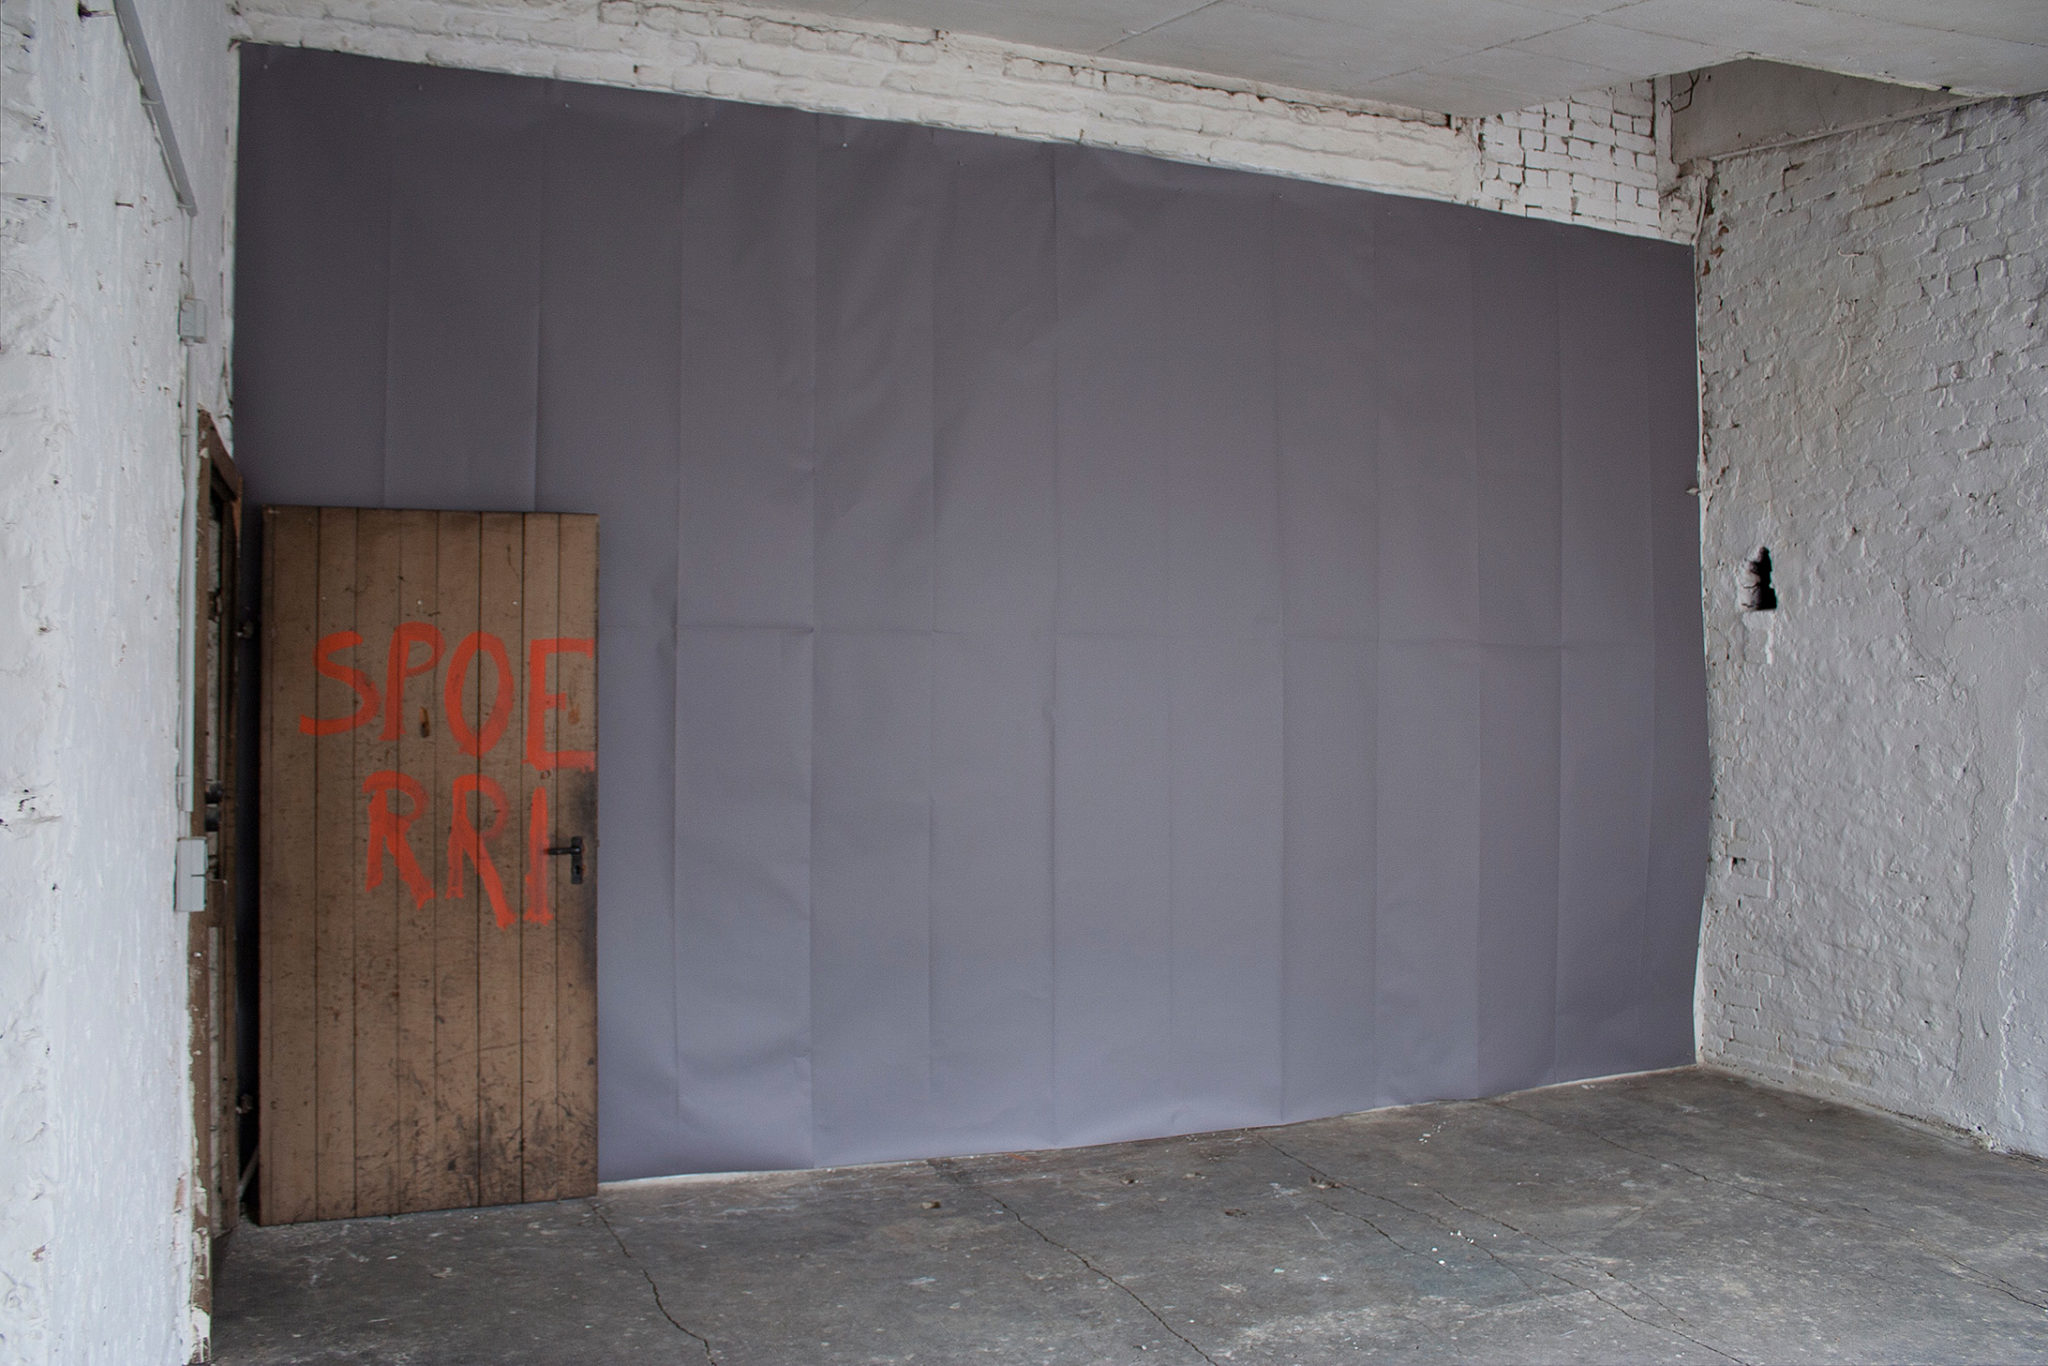 13-Gaylen-Gerber_Studio-for-Propositional-Cinema_18.-Oktober_-8.-November_2015